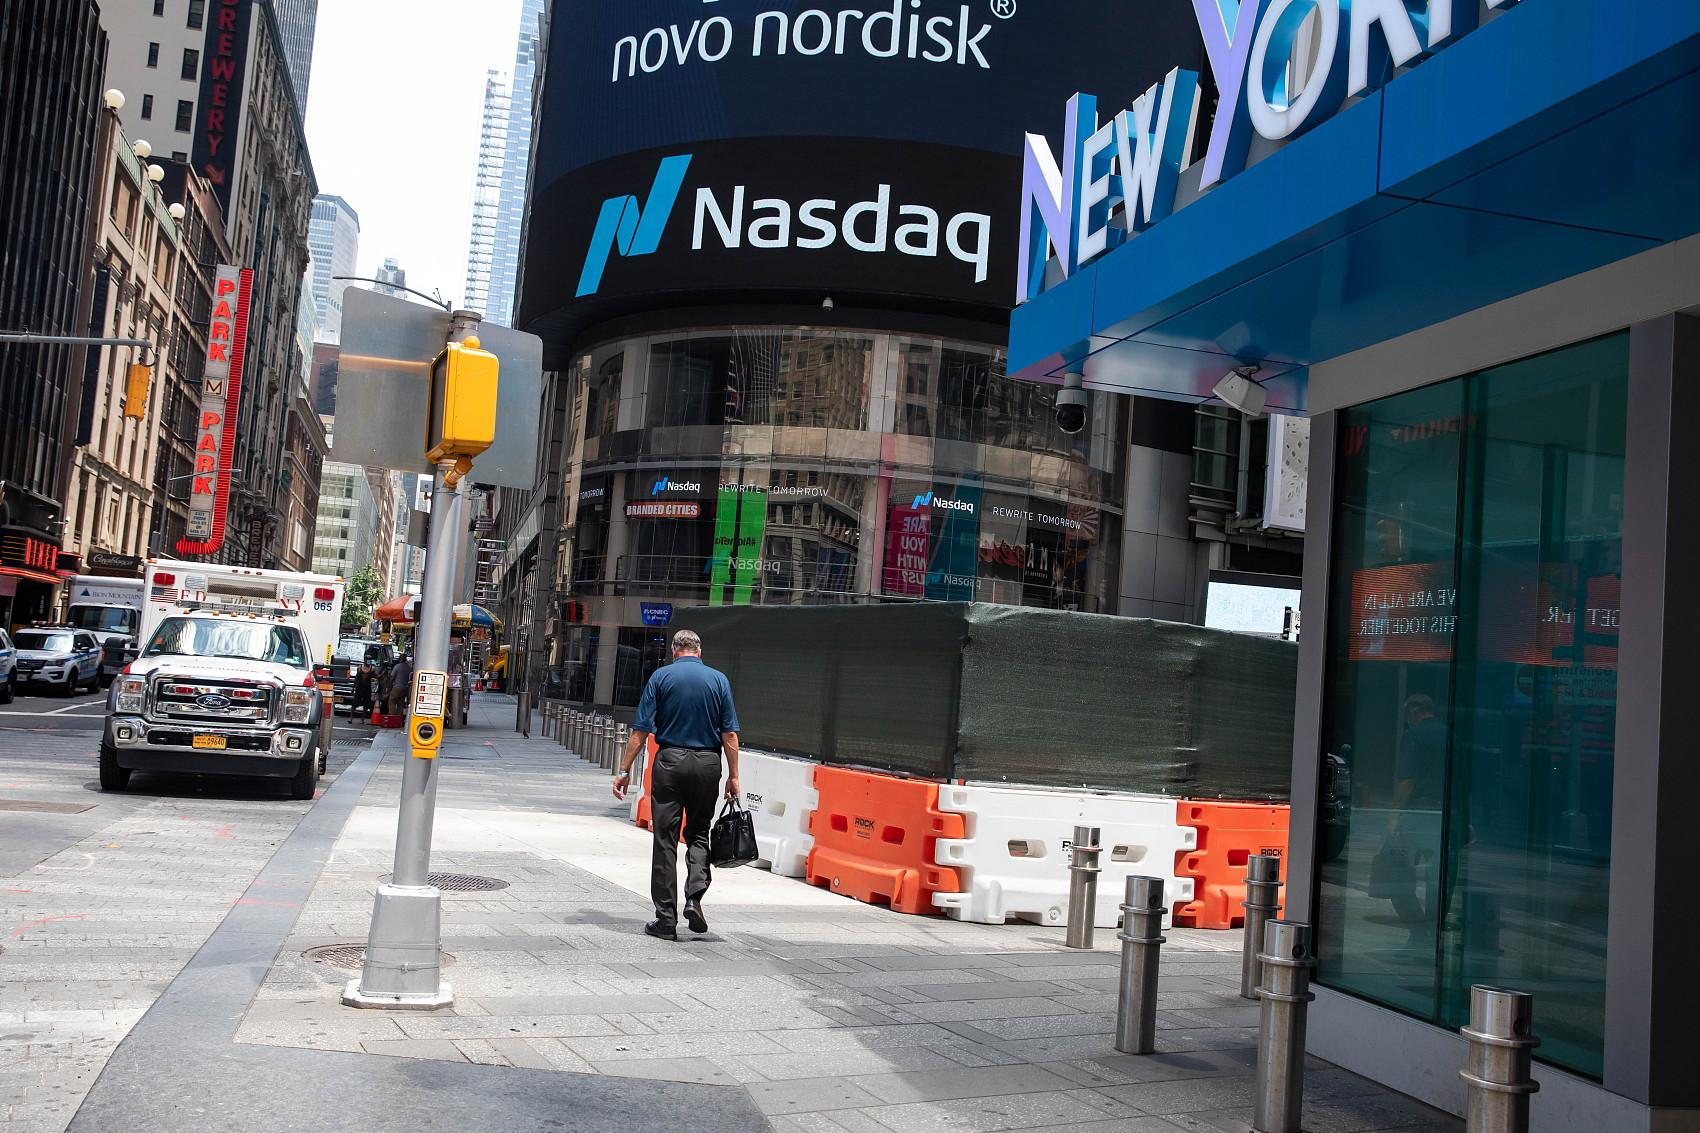 US stocks open mixed amid rallying tech shares, coronavirus concerns